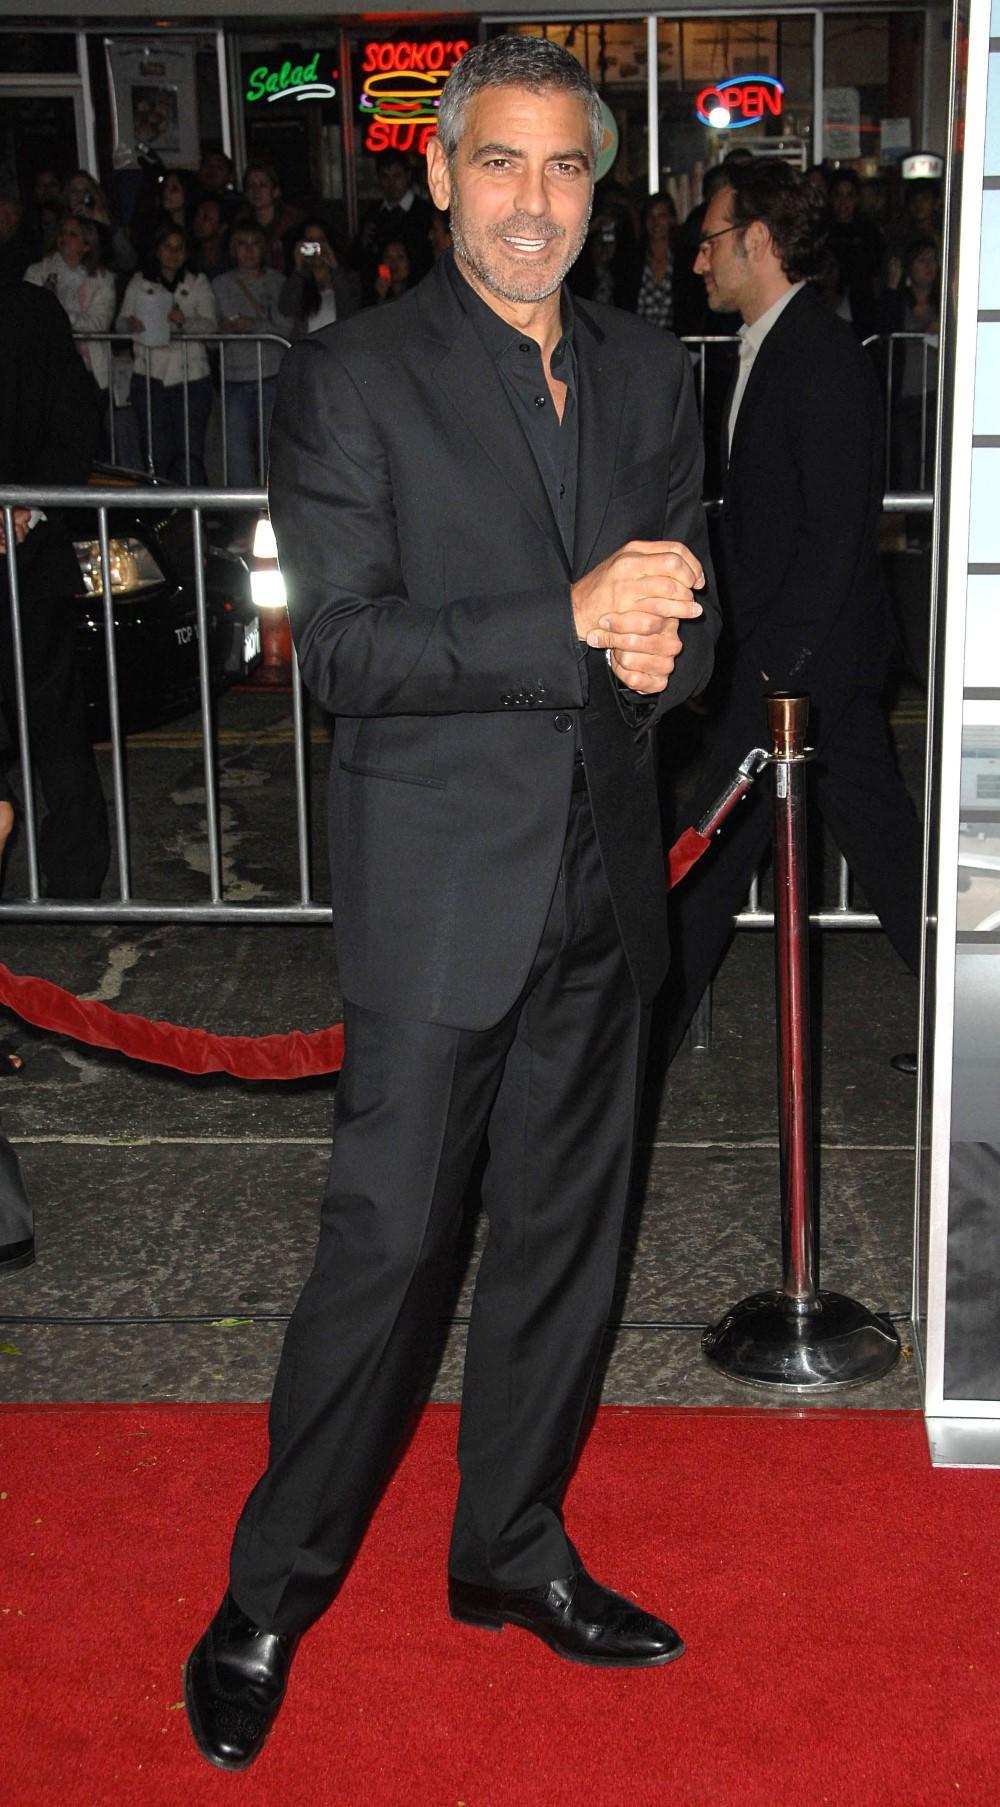 George Clooney's Red Carpet Style | Fandango